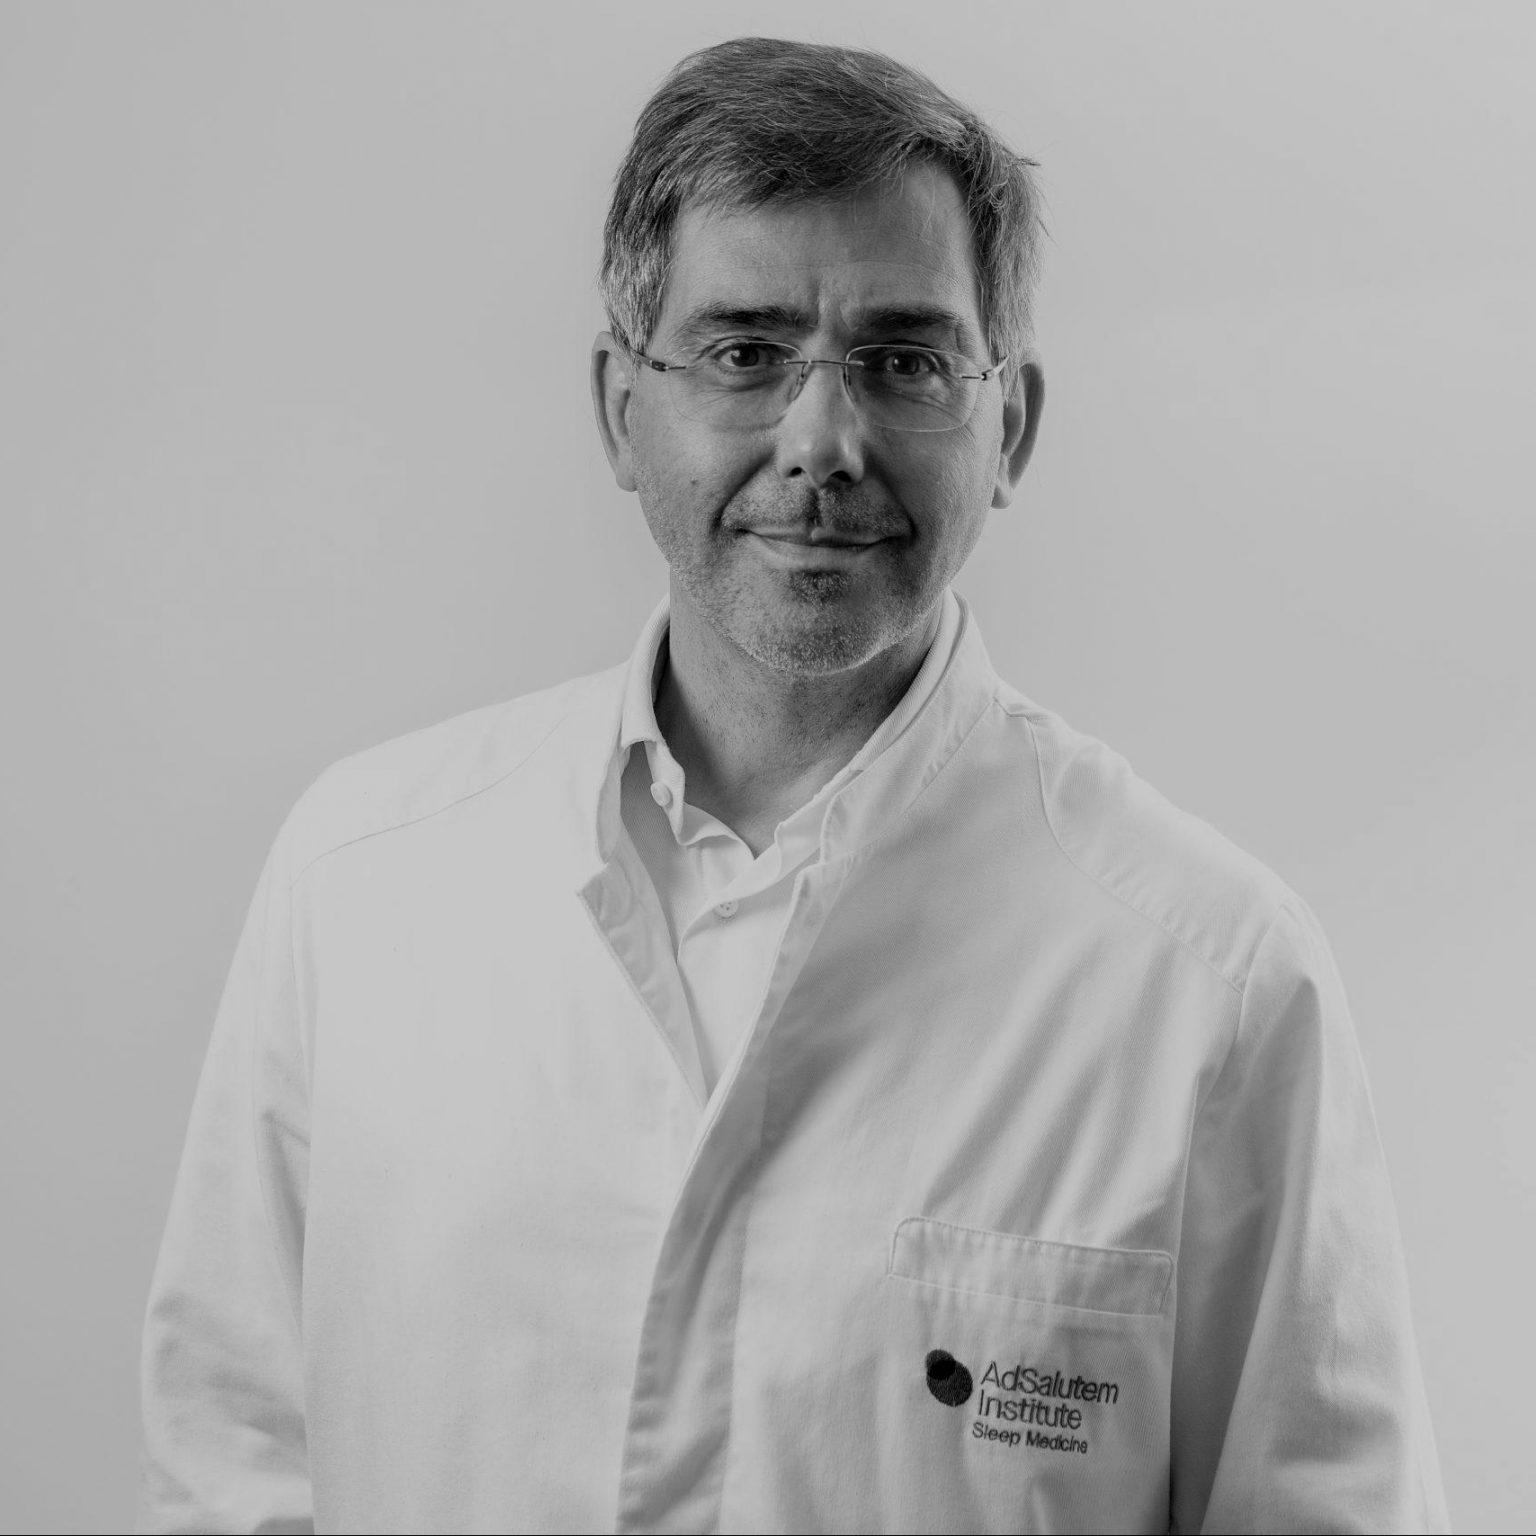 Robert Cilveti